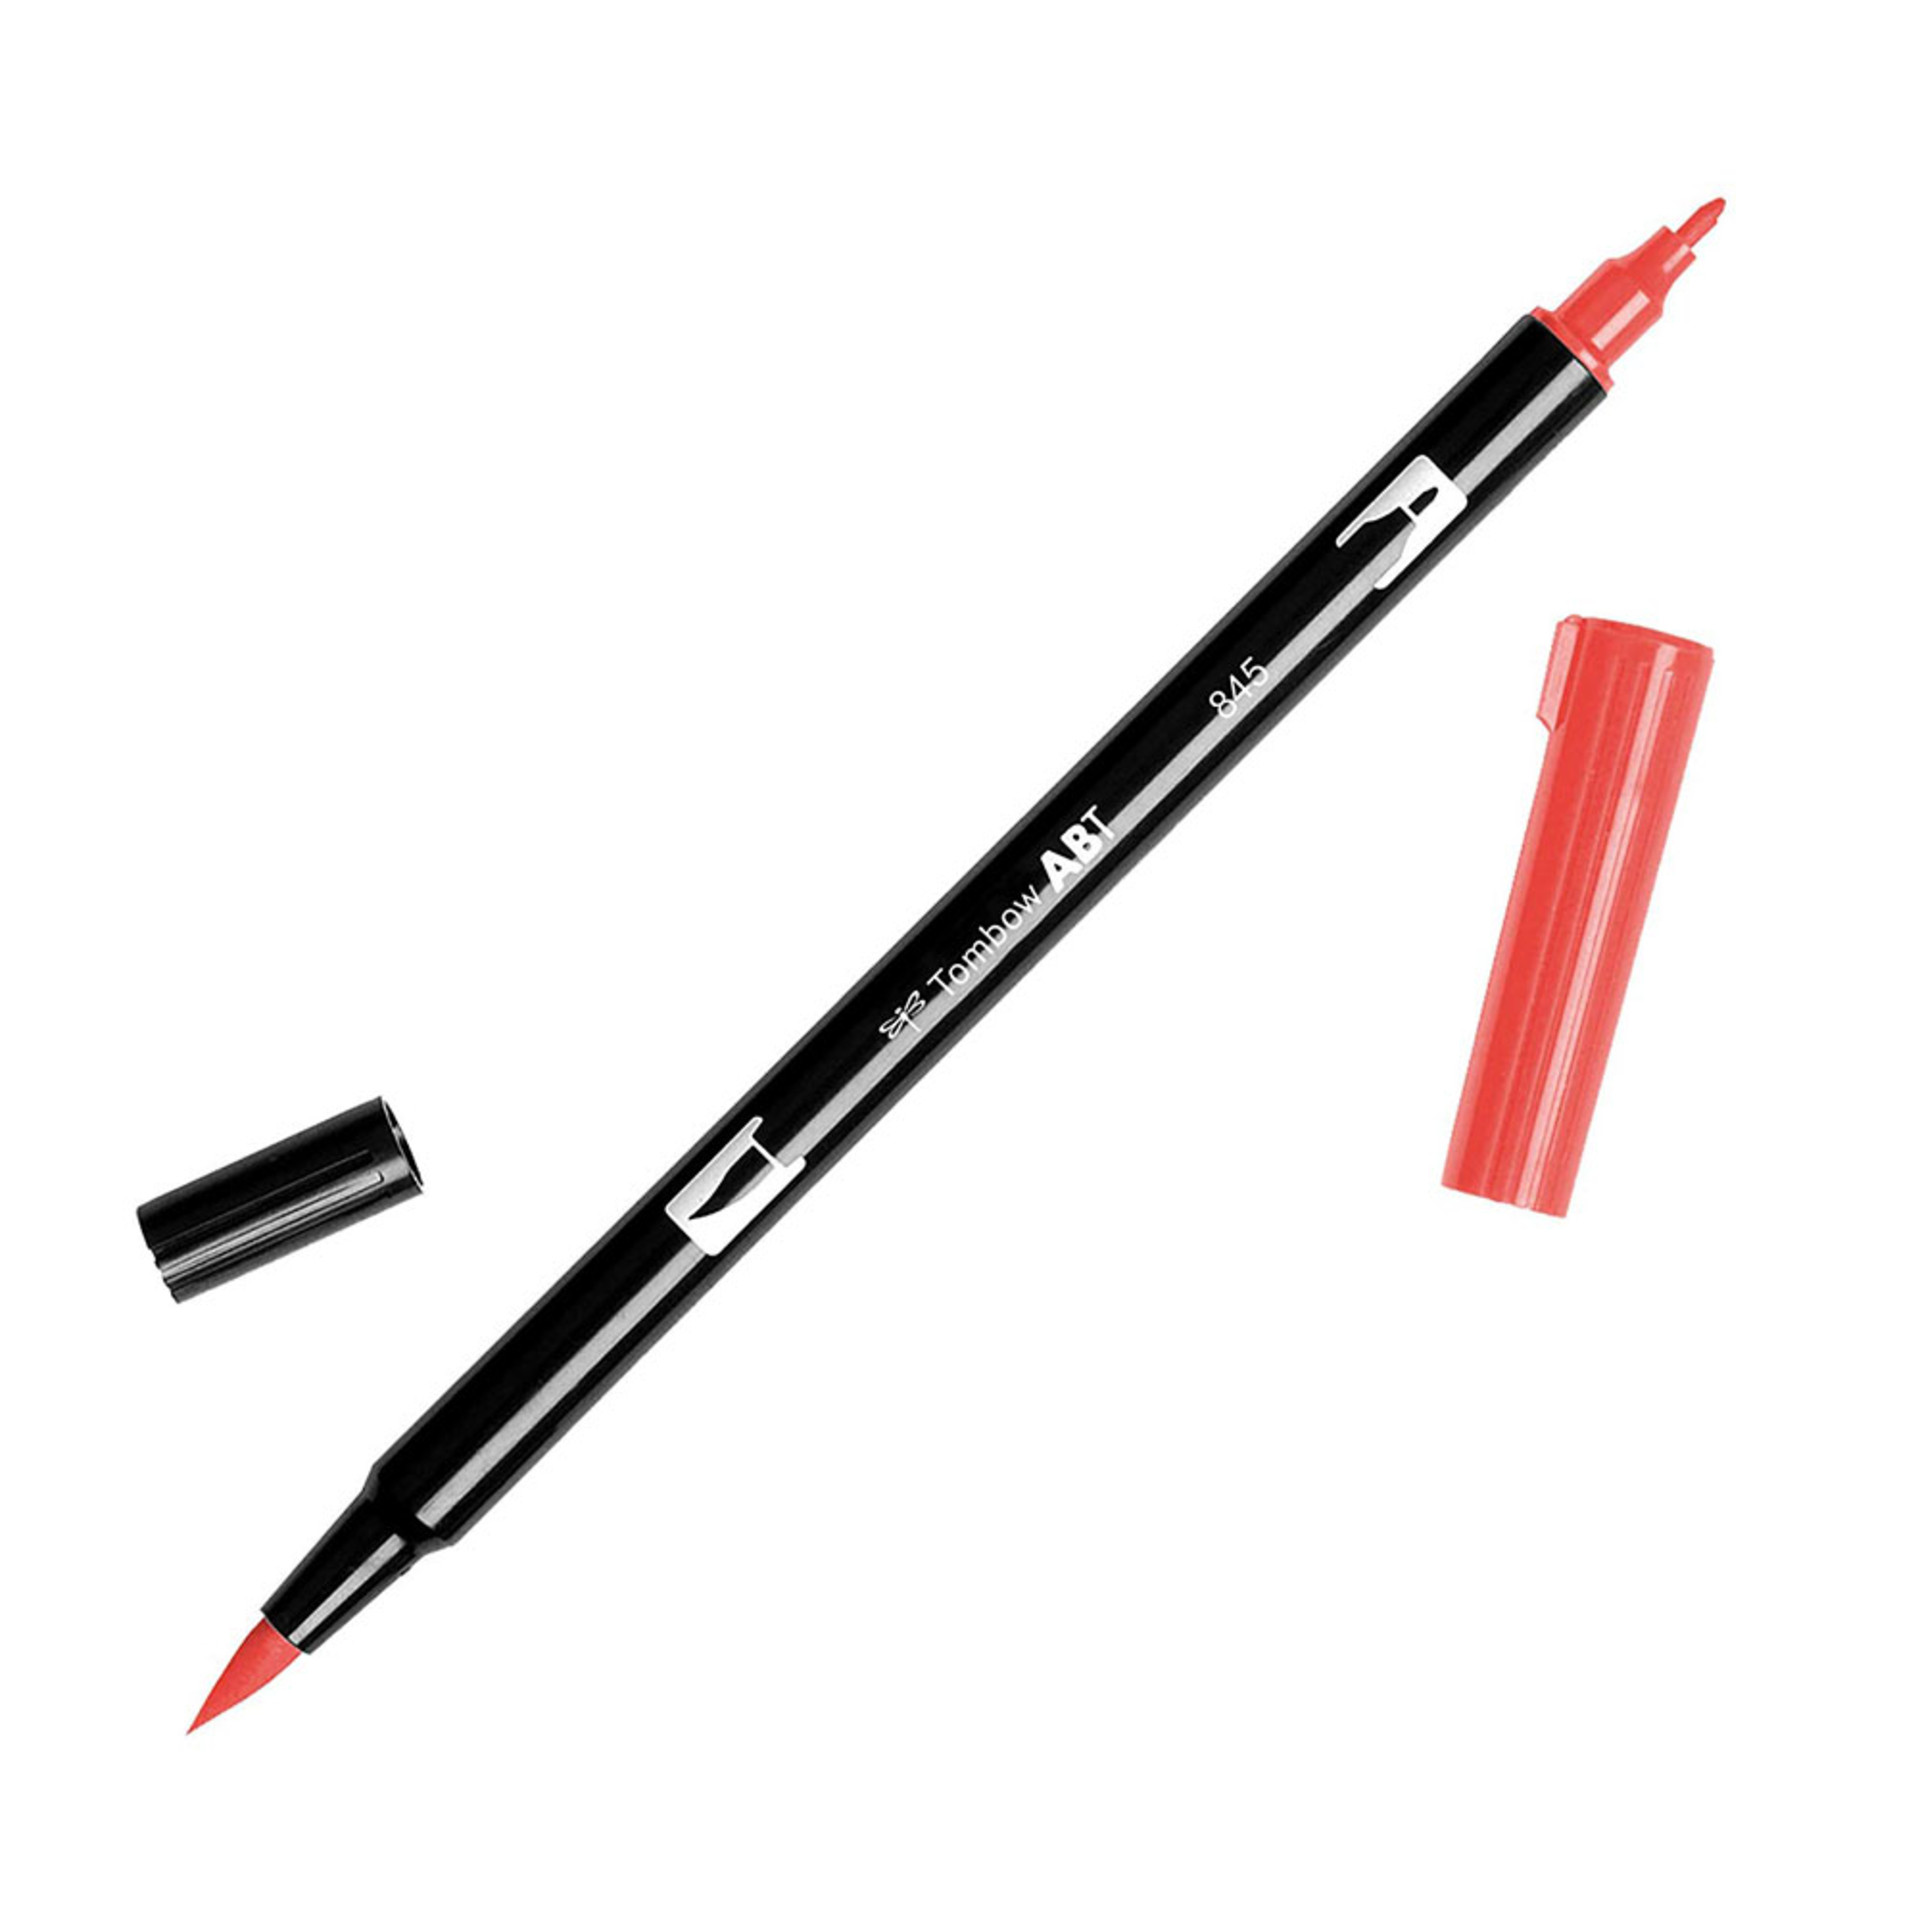 Tombow Dual-Tip Brush Marker Pen – Carmine